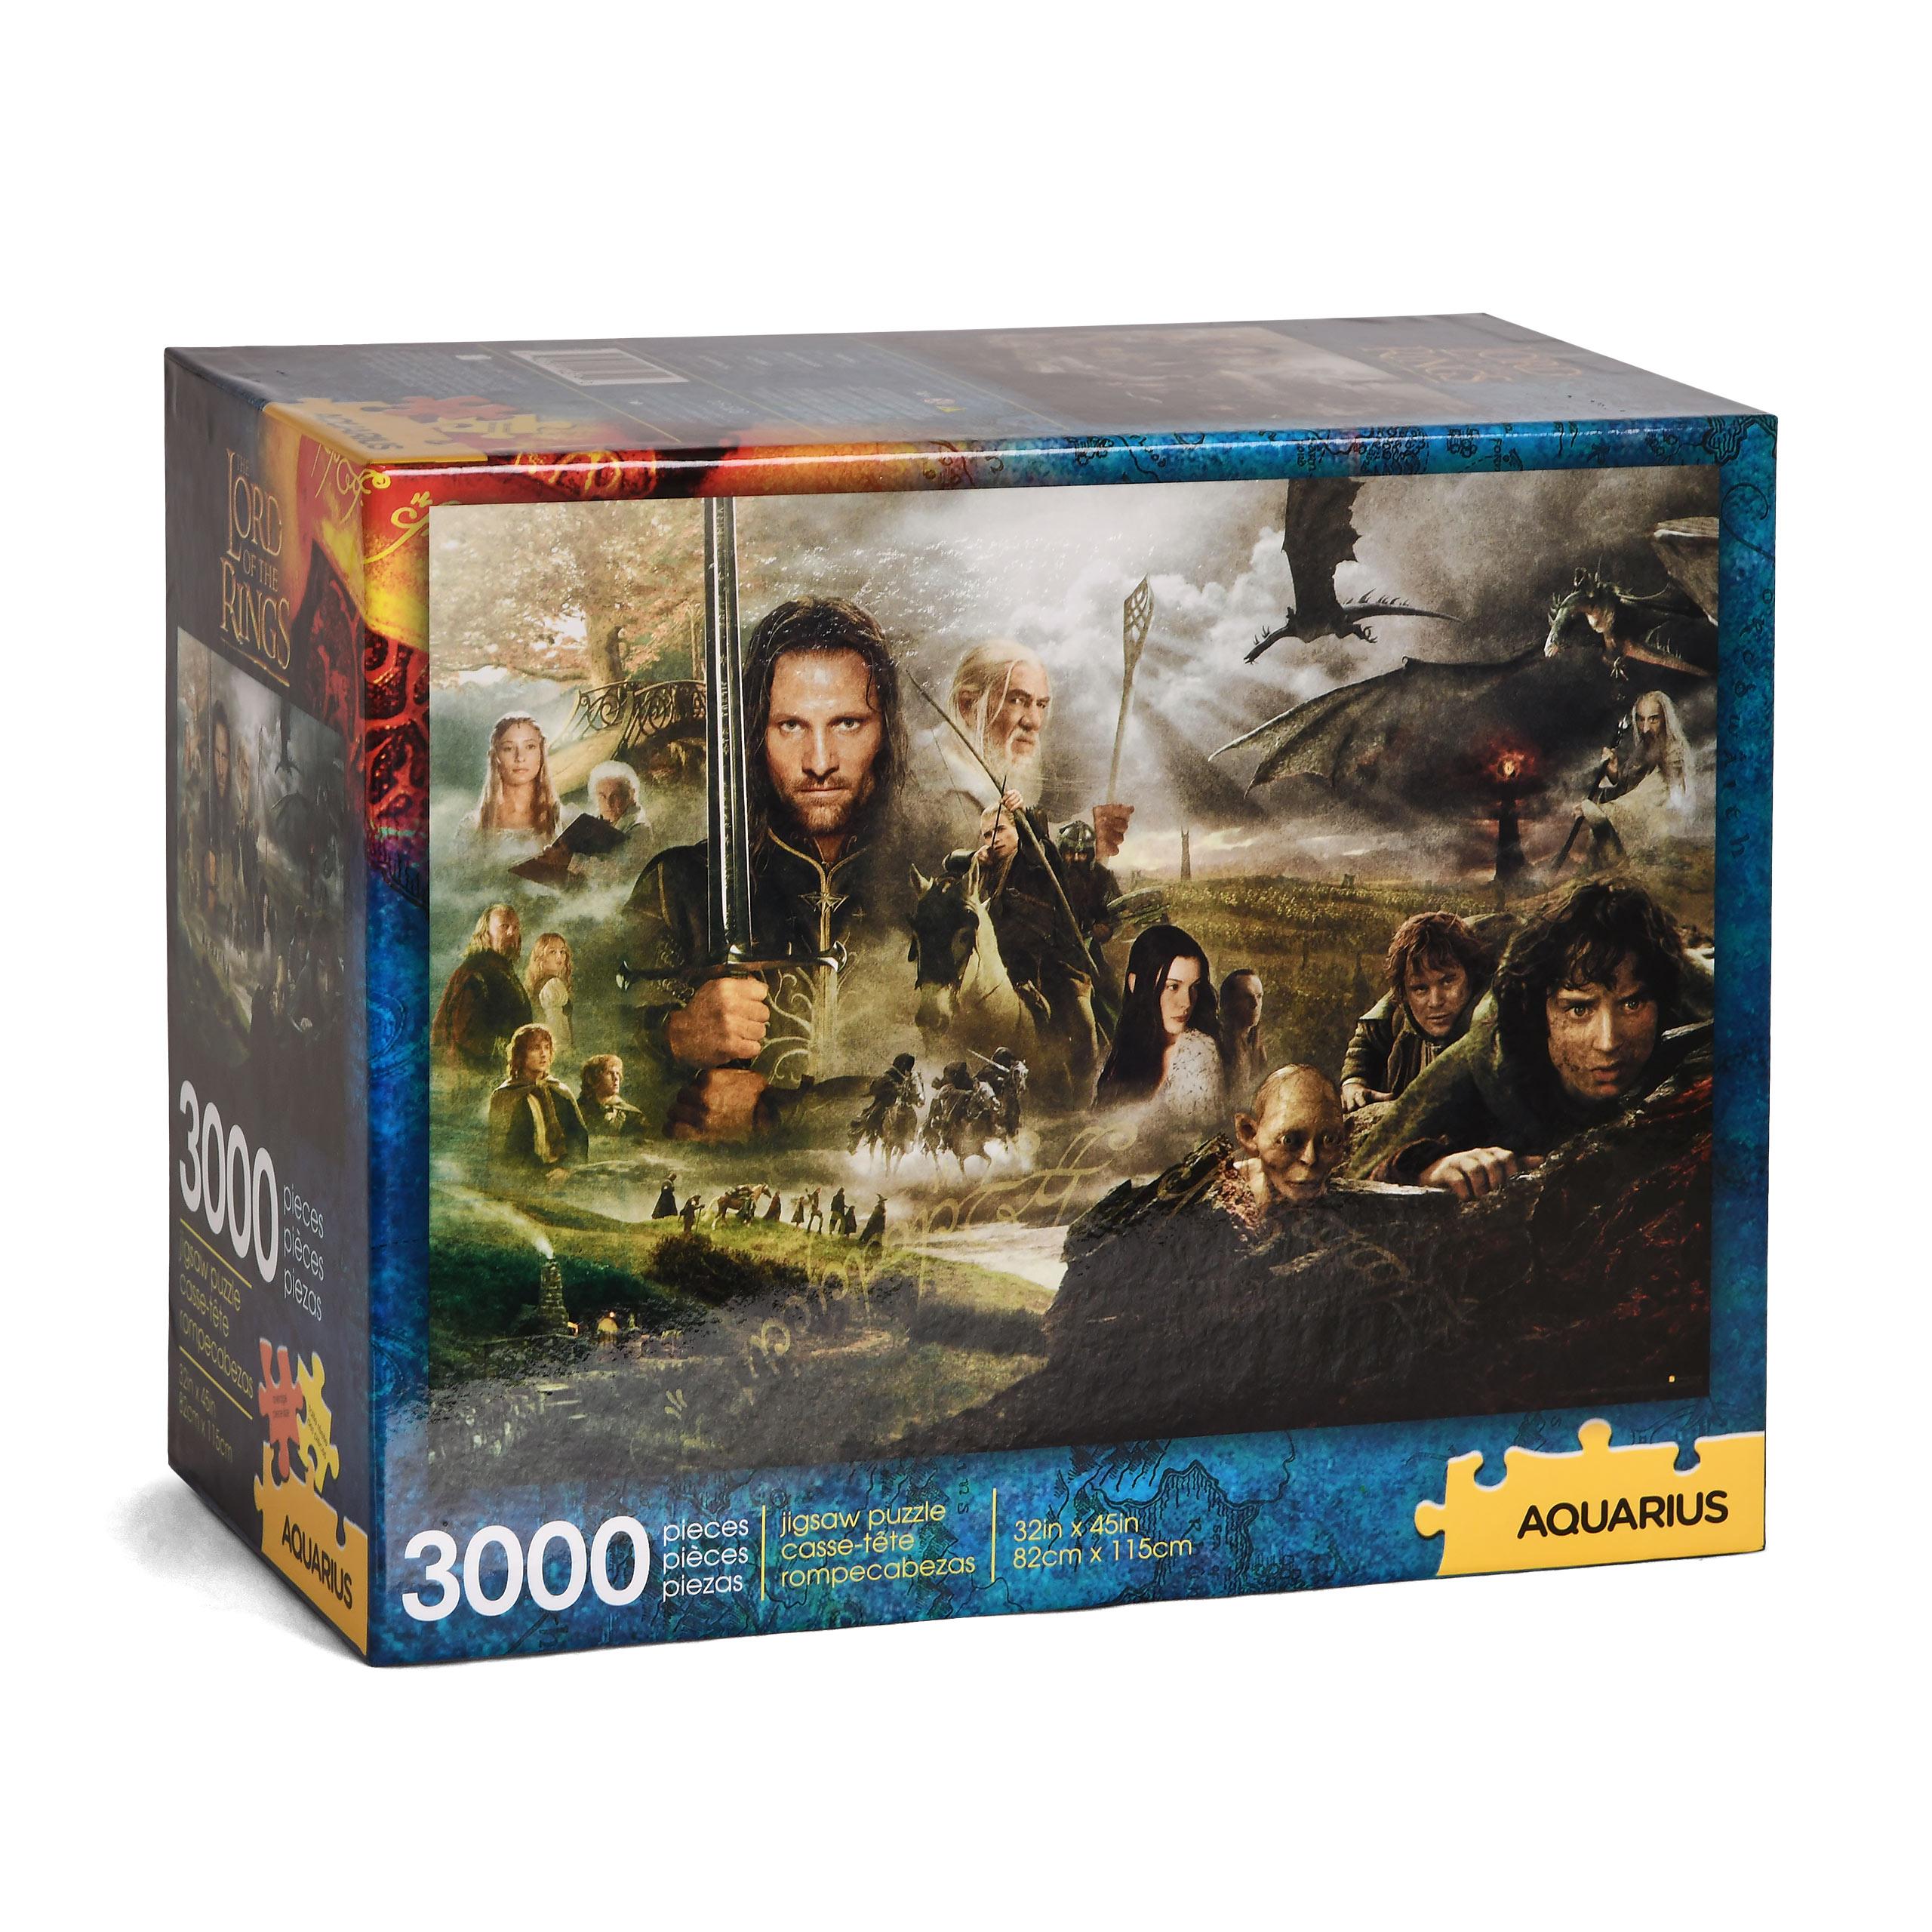 Herr der Ringe - Saga Puzzle 3000 Teile